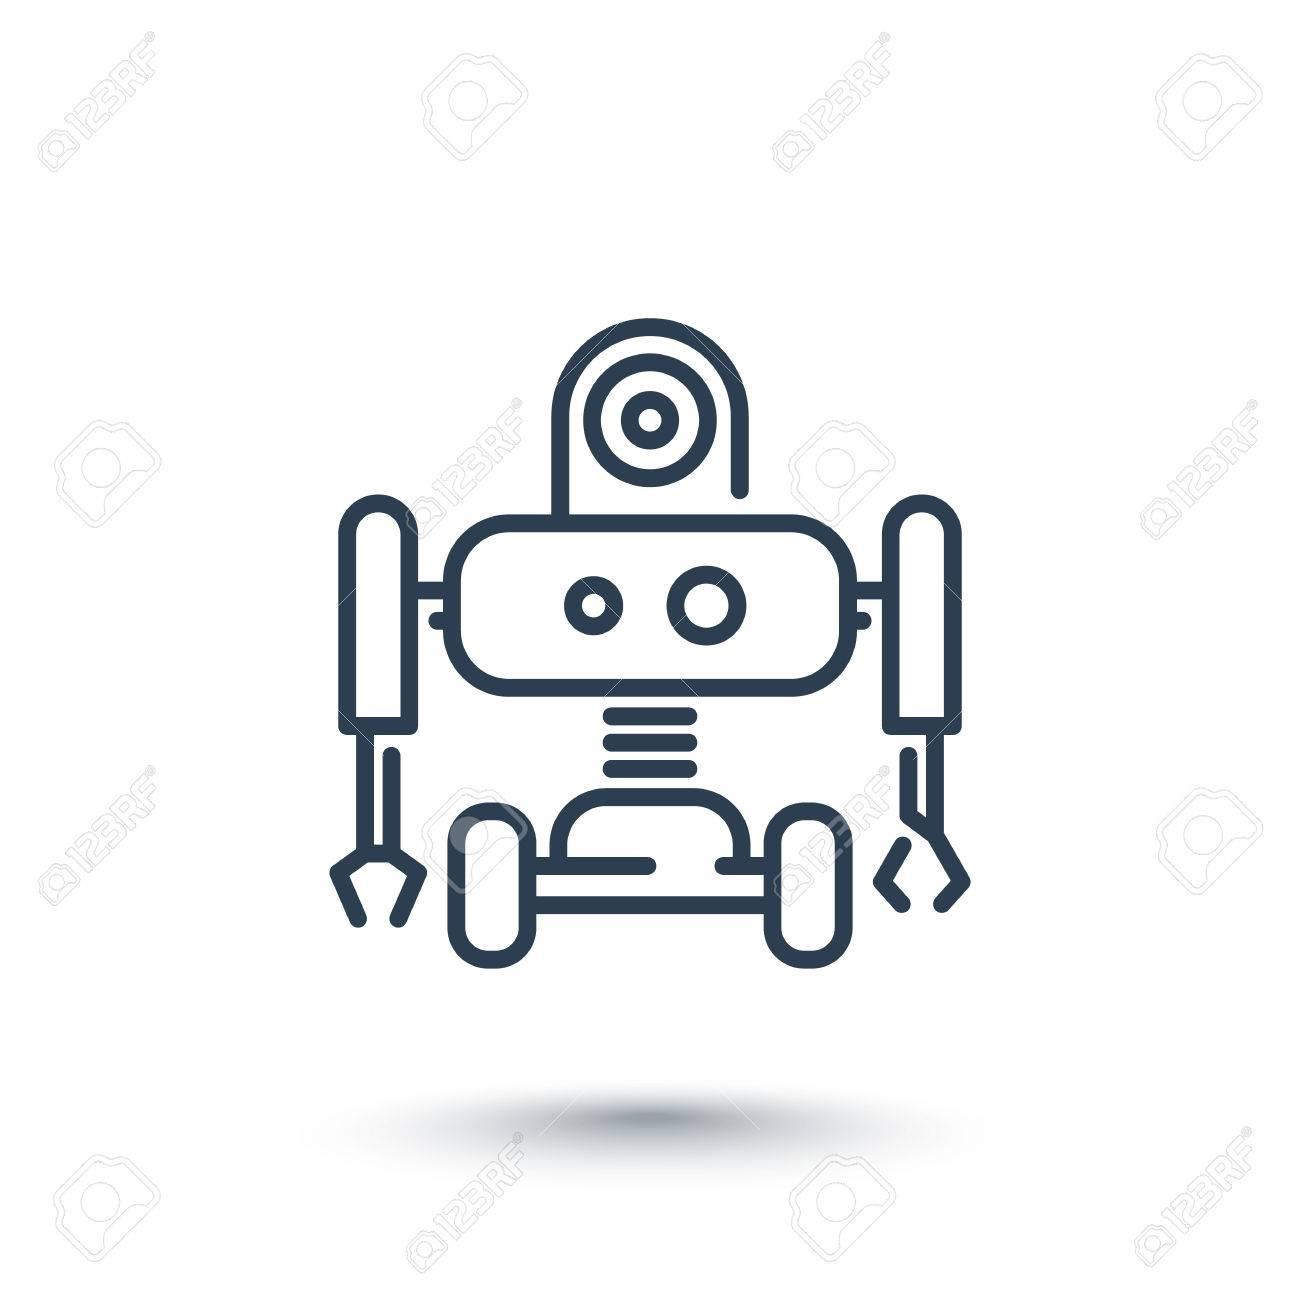 Robotics Line Icon Robot Pictogram Isolated On White Illustration